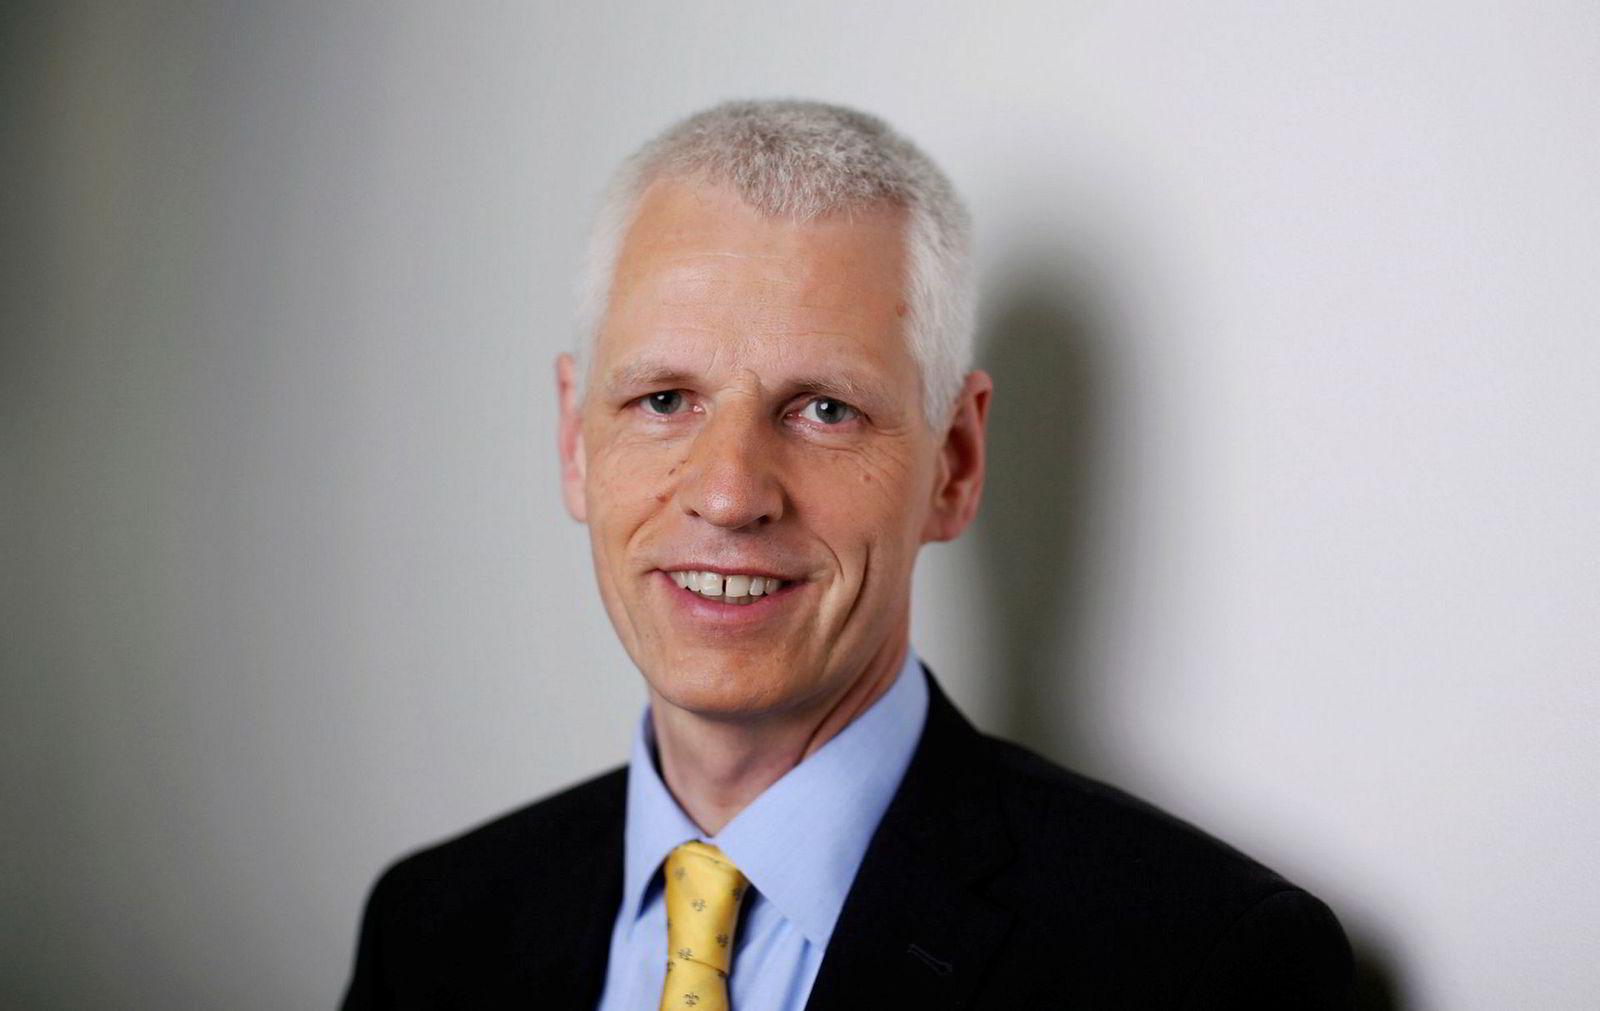 Sjeføkonom Holger Schmieding i Berenberg Bank.